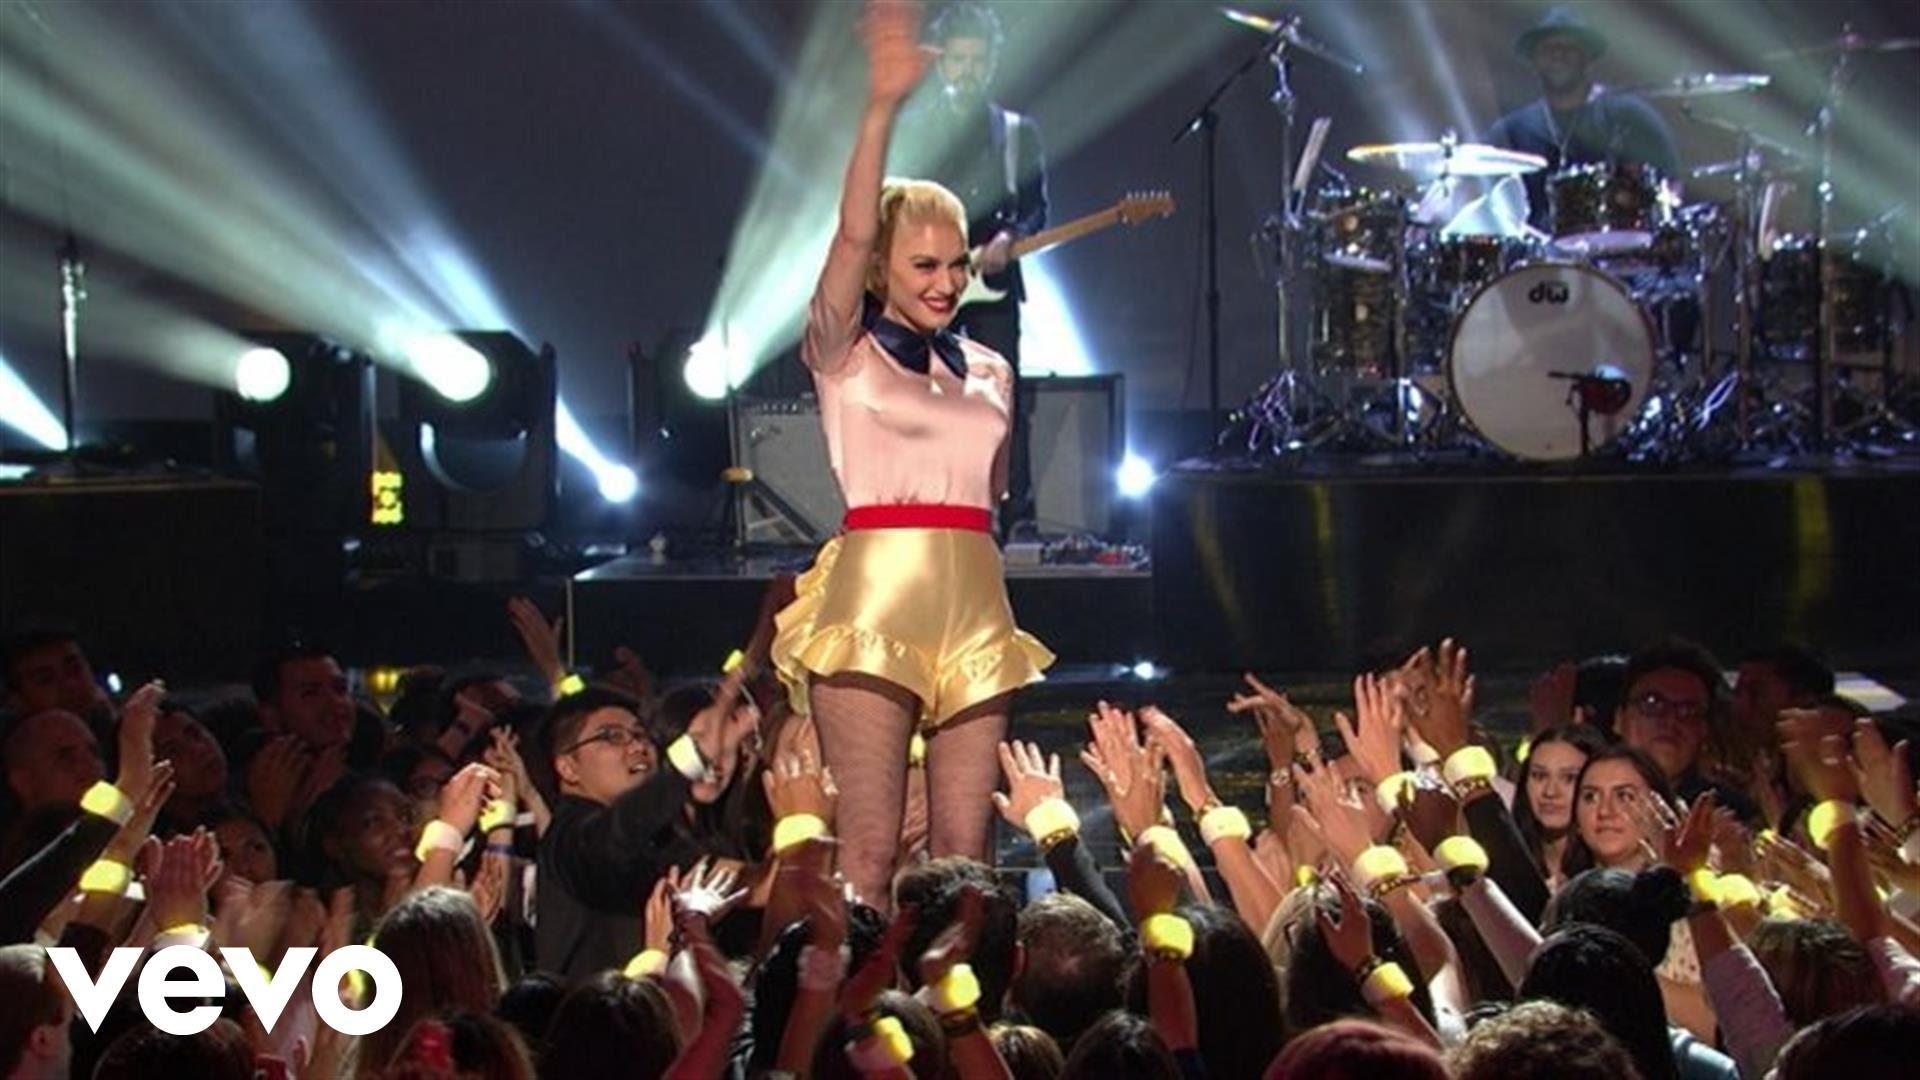 Gwen Stefani reveals Las Vegas residency at Planet Hollywood